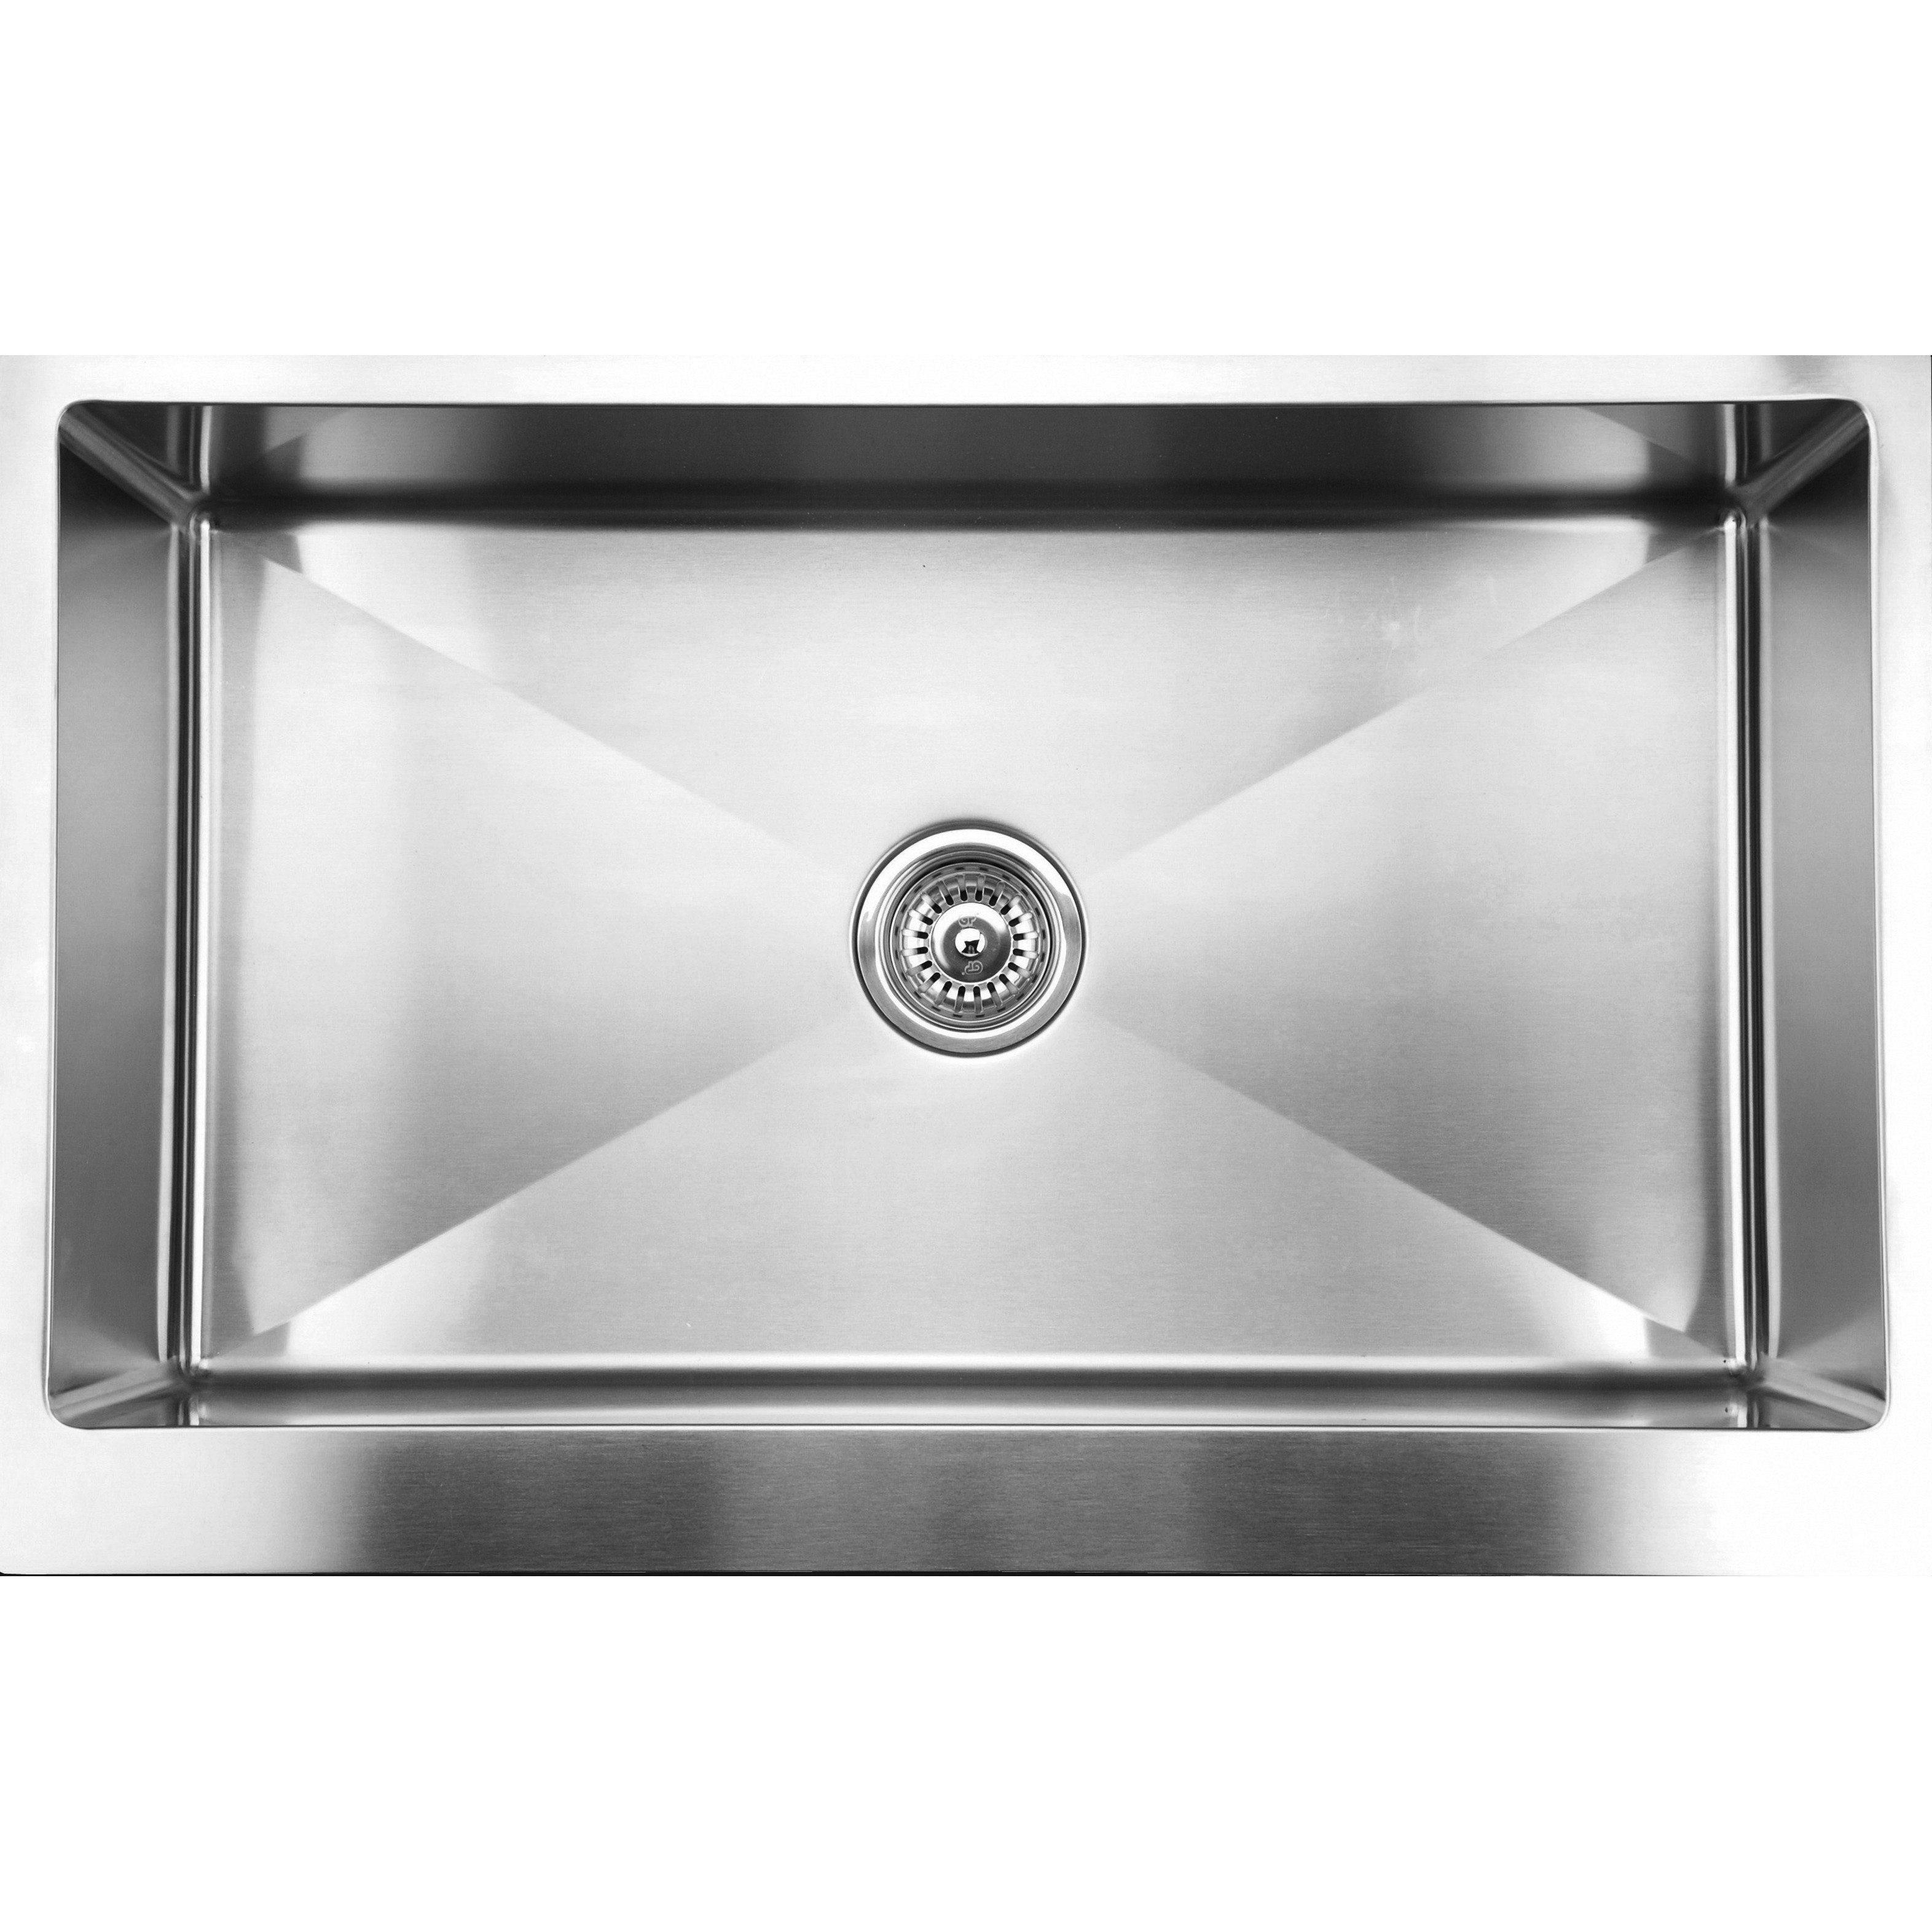 Ukinox RSFS840 Apron Front 33 Inch Single Basin Stainless Steel Undermount Kitchen Sink